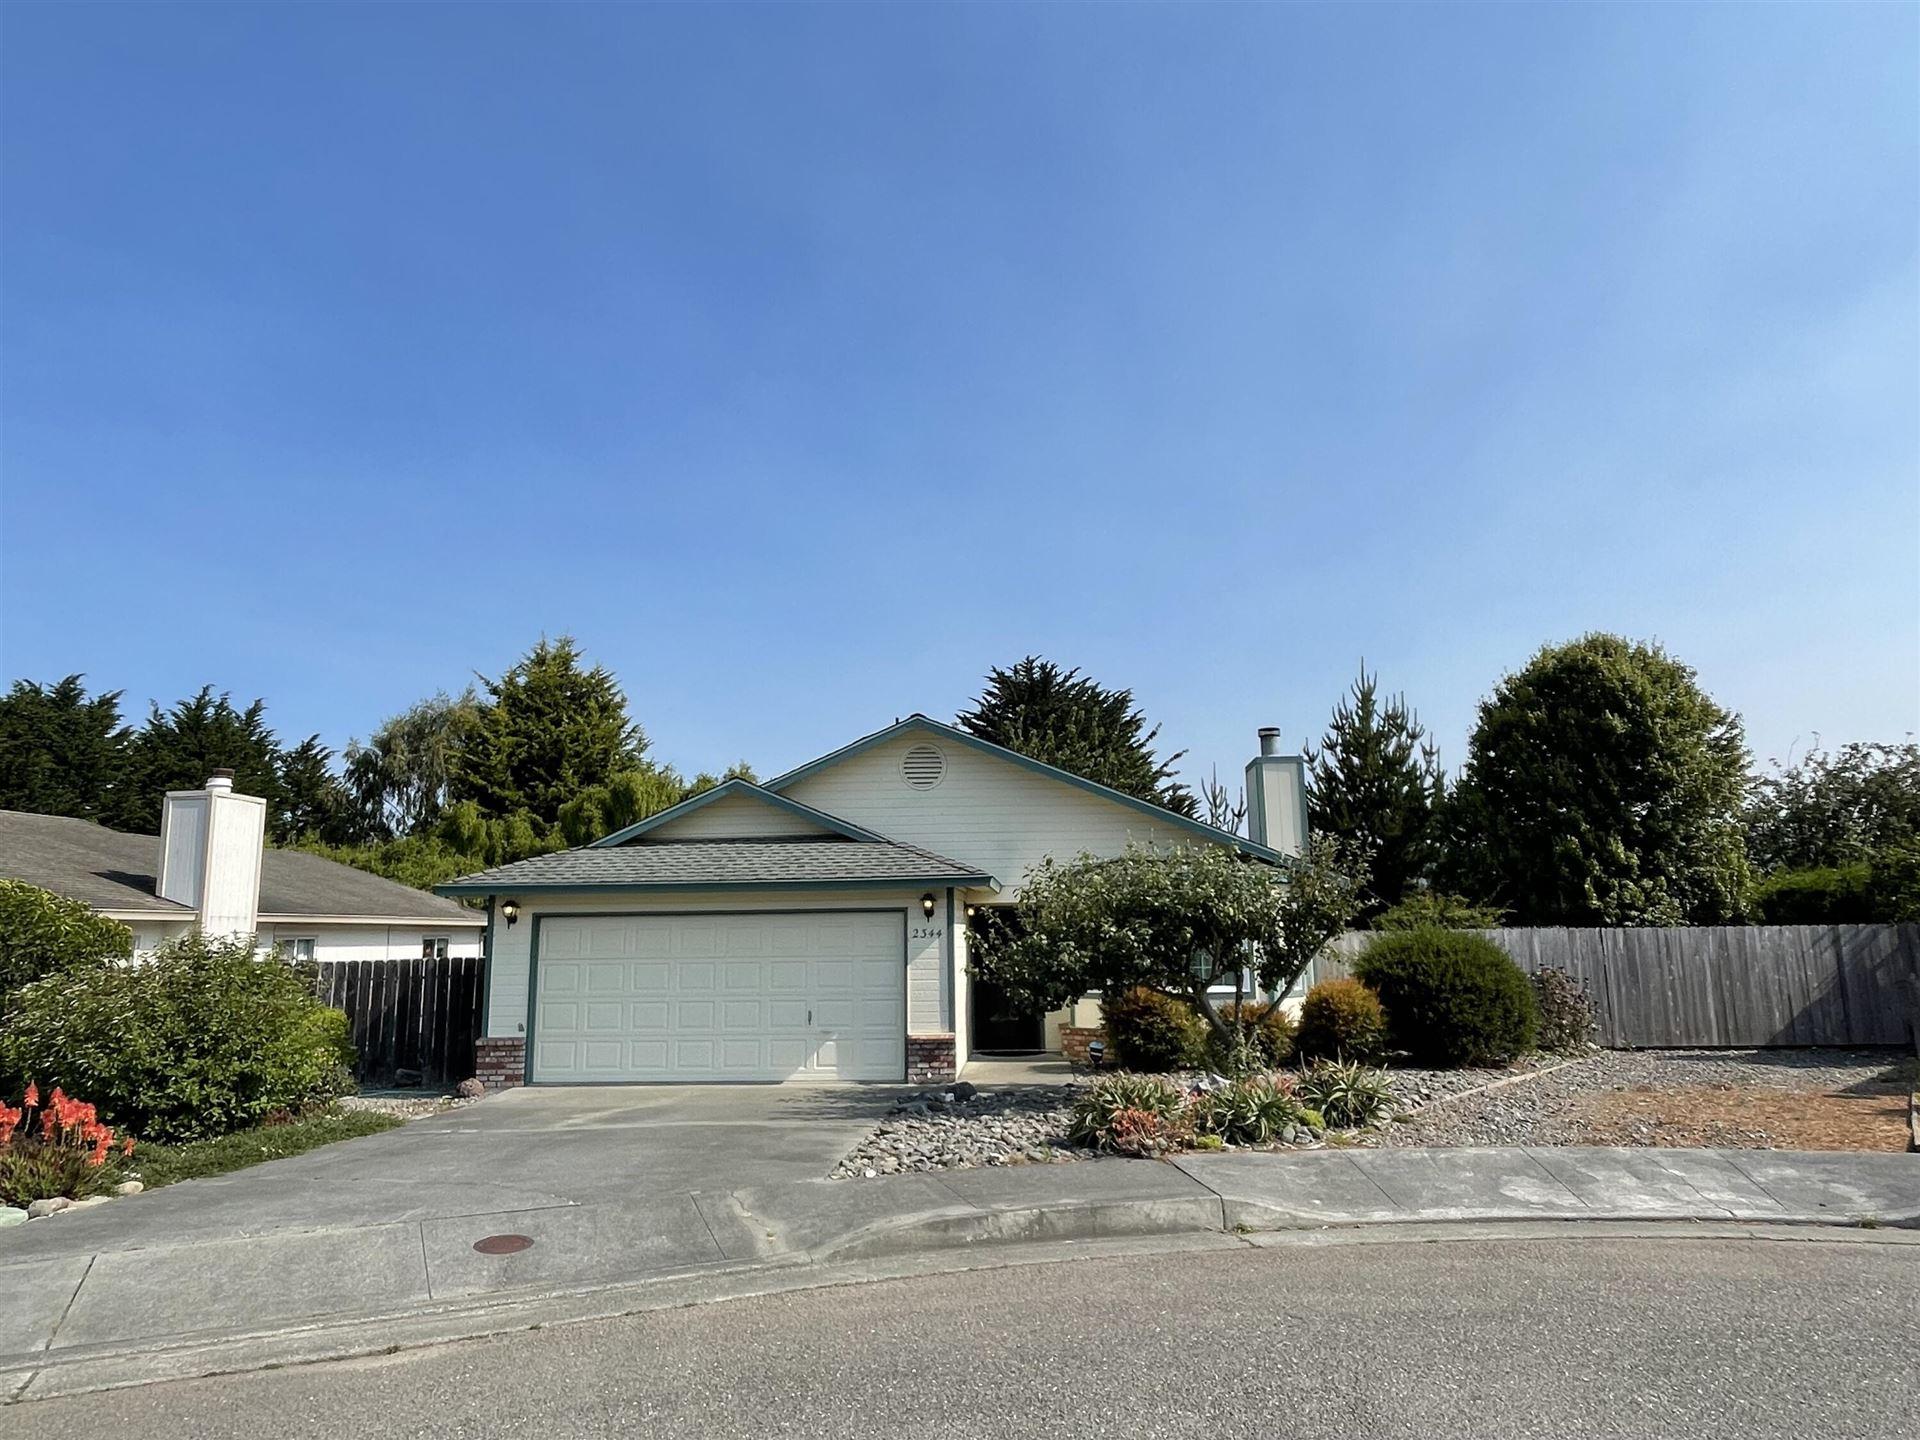 2344 Hannah Court, Fortuna, CA 95540 - MLS#: 259694